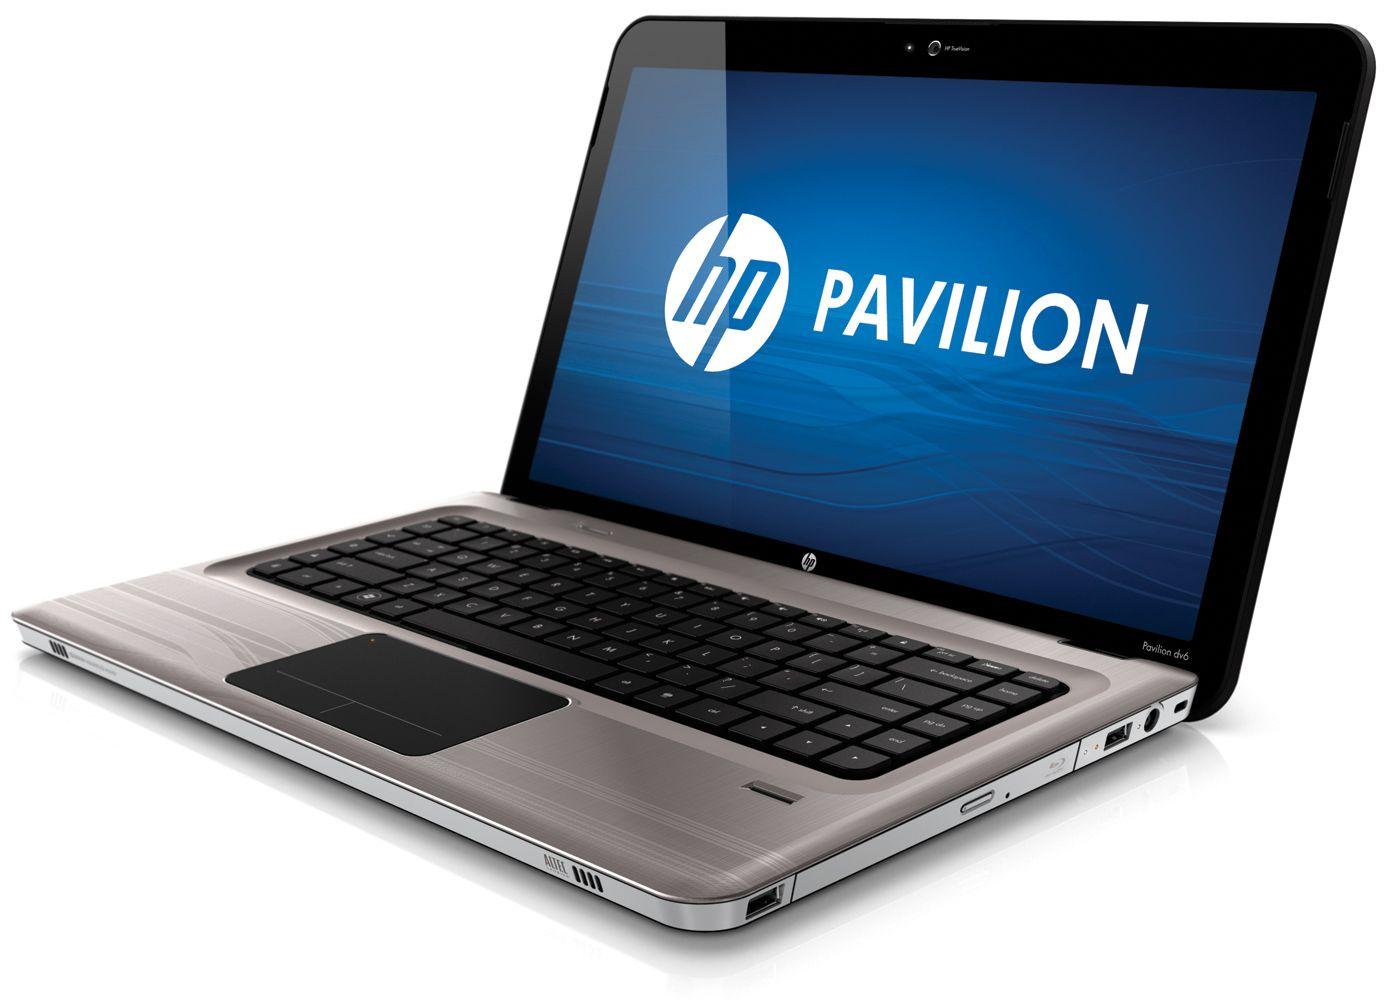 Thay bản lề laptop HP tphcm lấy ngay